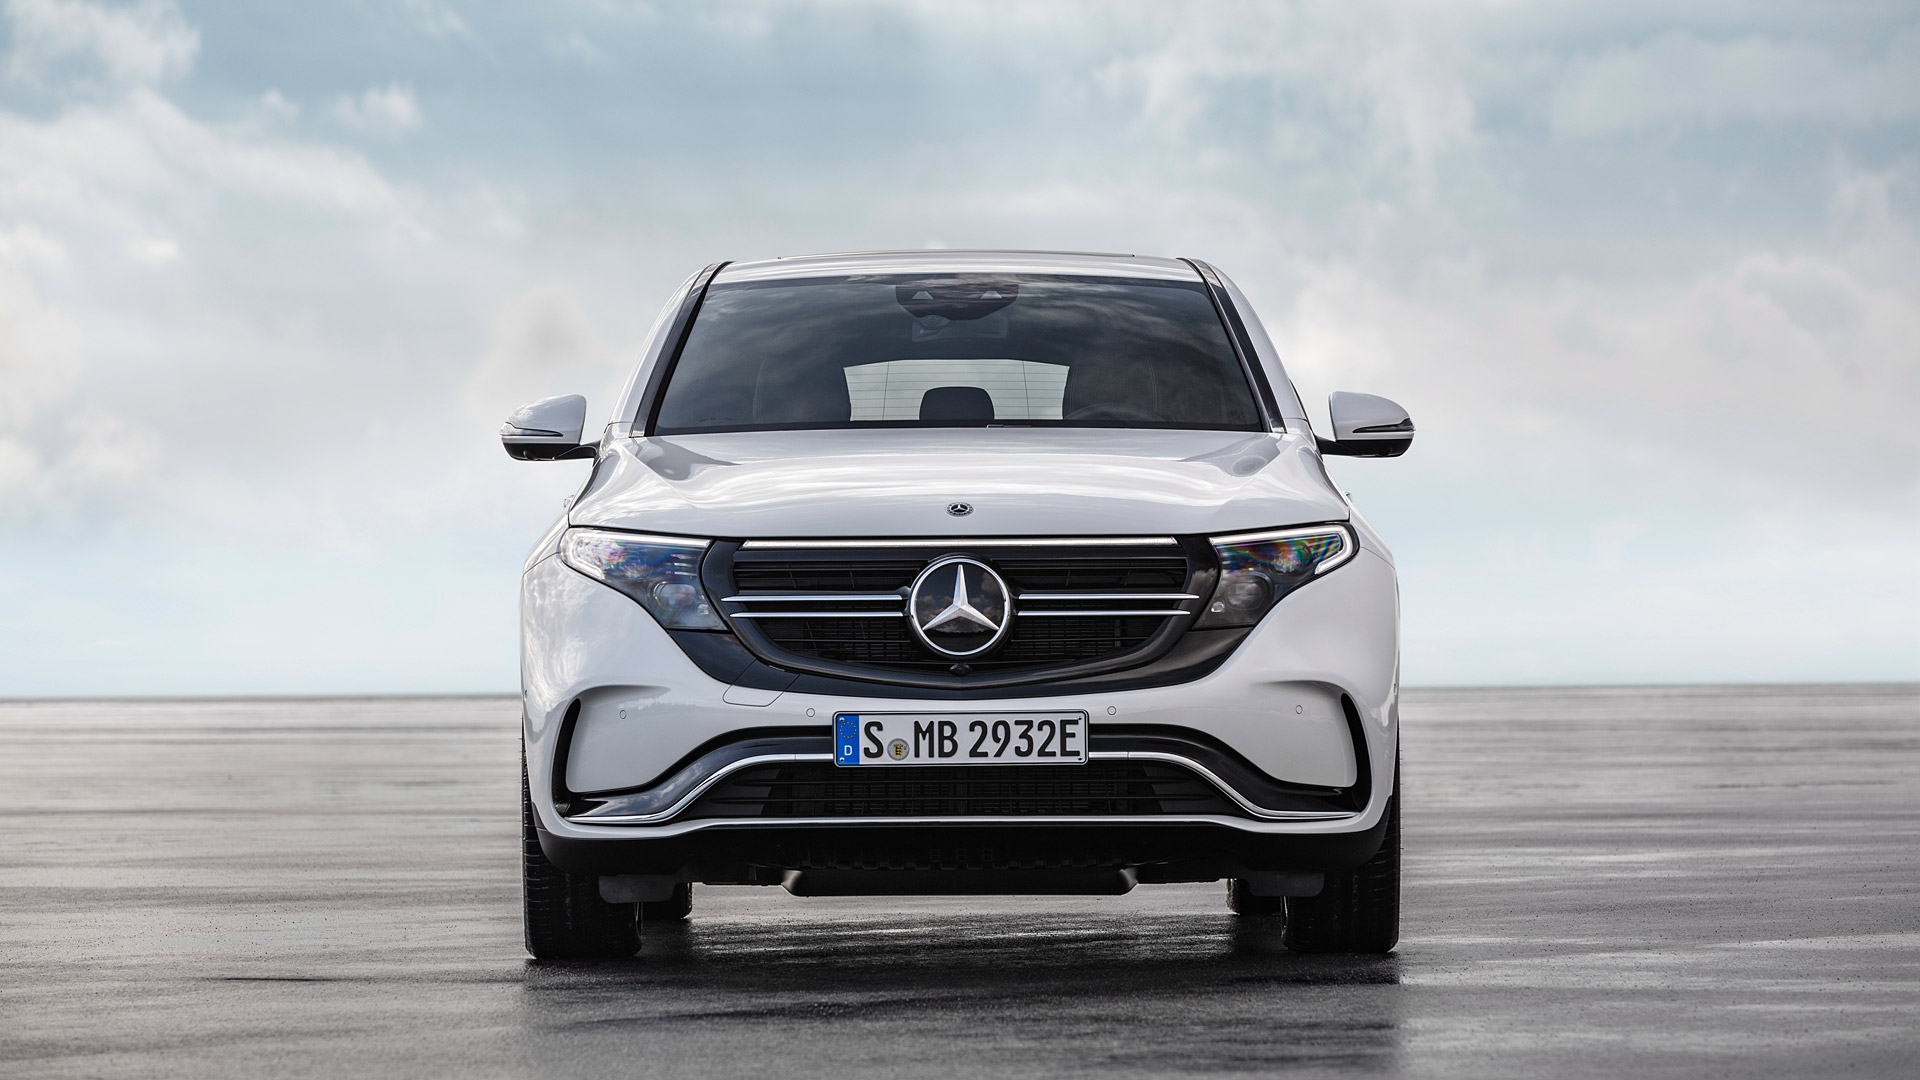 2020 Mercedes Benz EQC Wallpapers HD Images   WSupercars 1920x1080